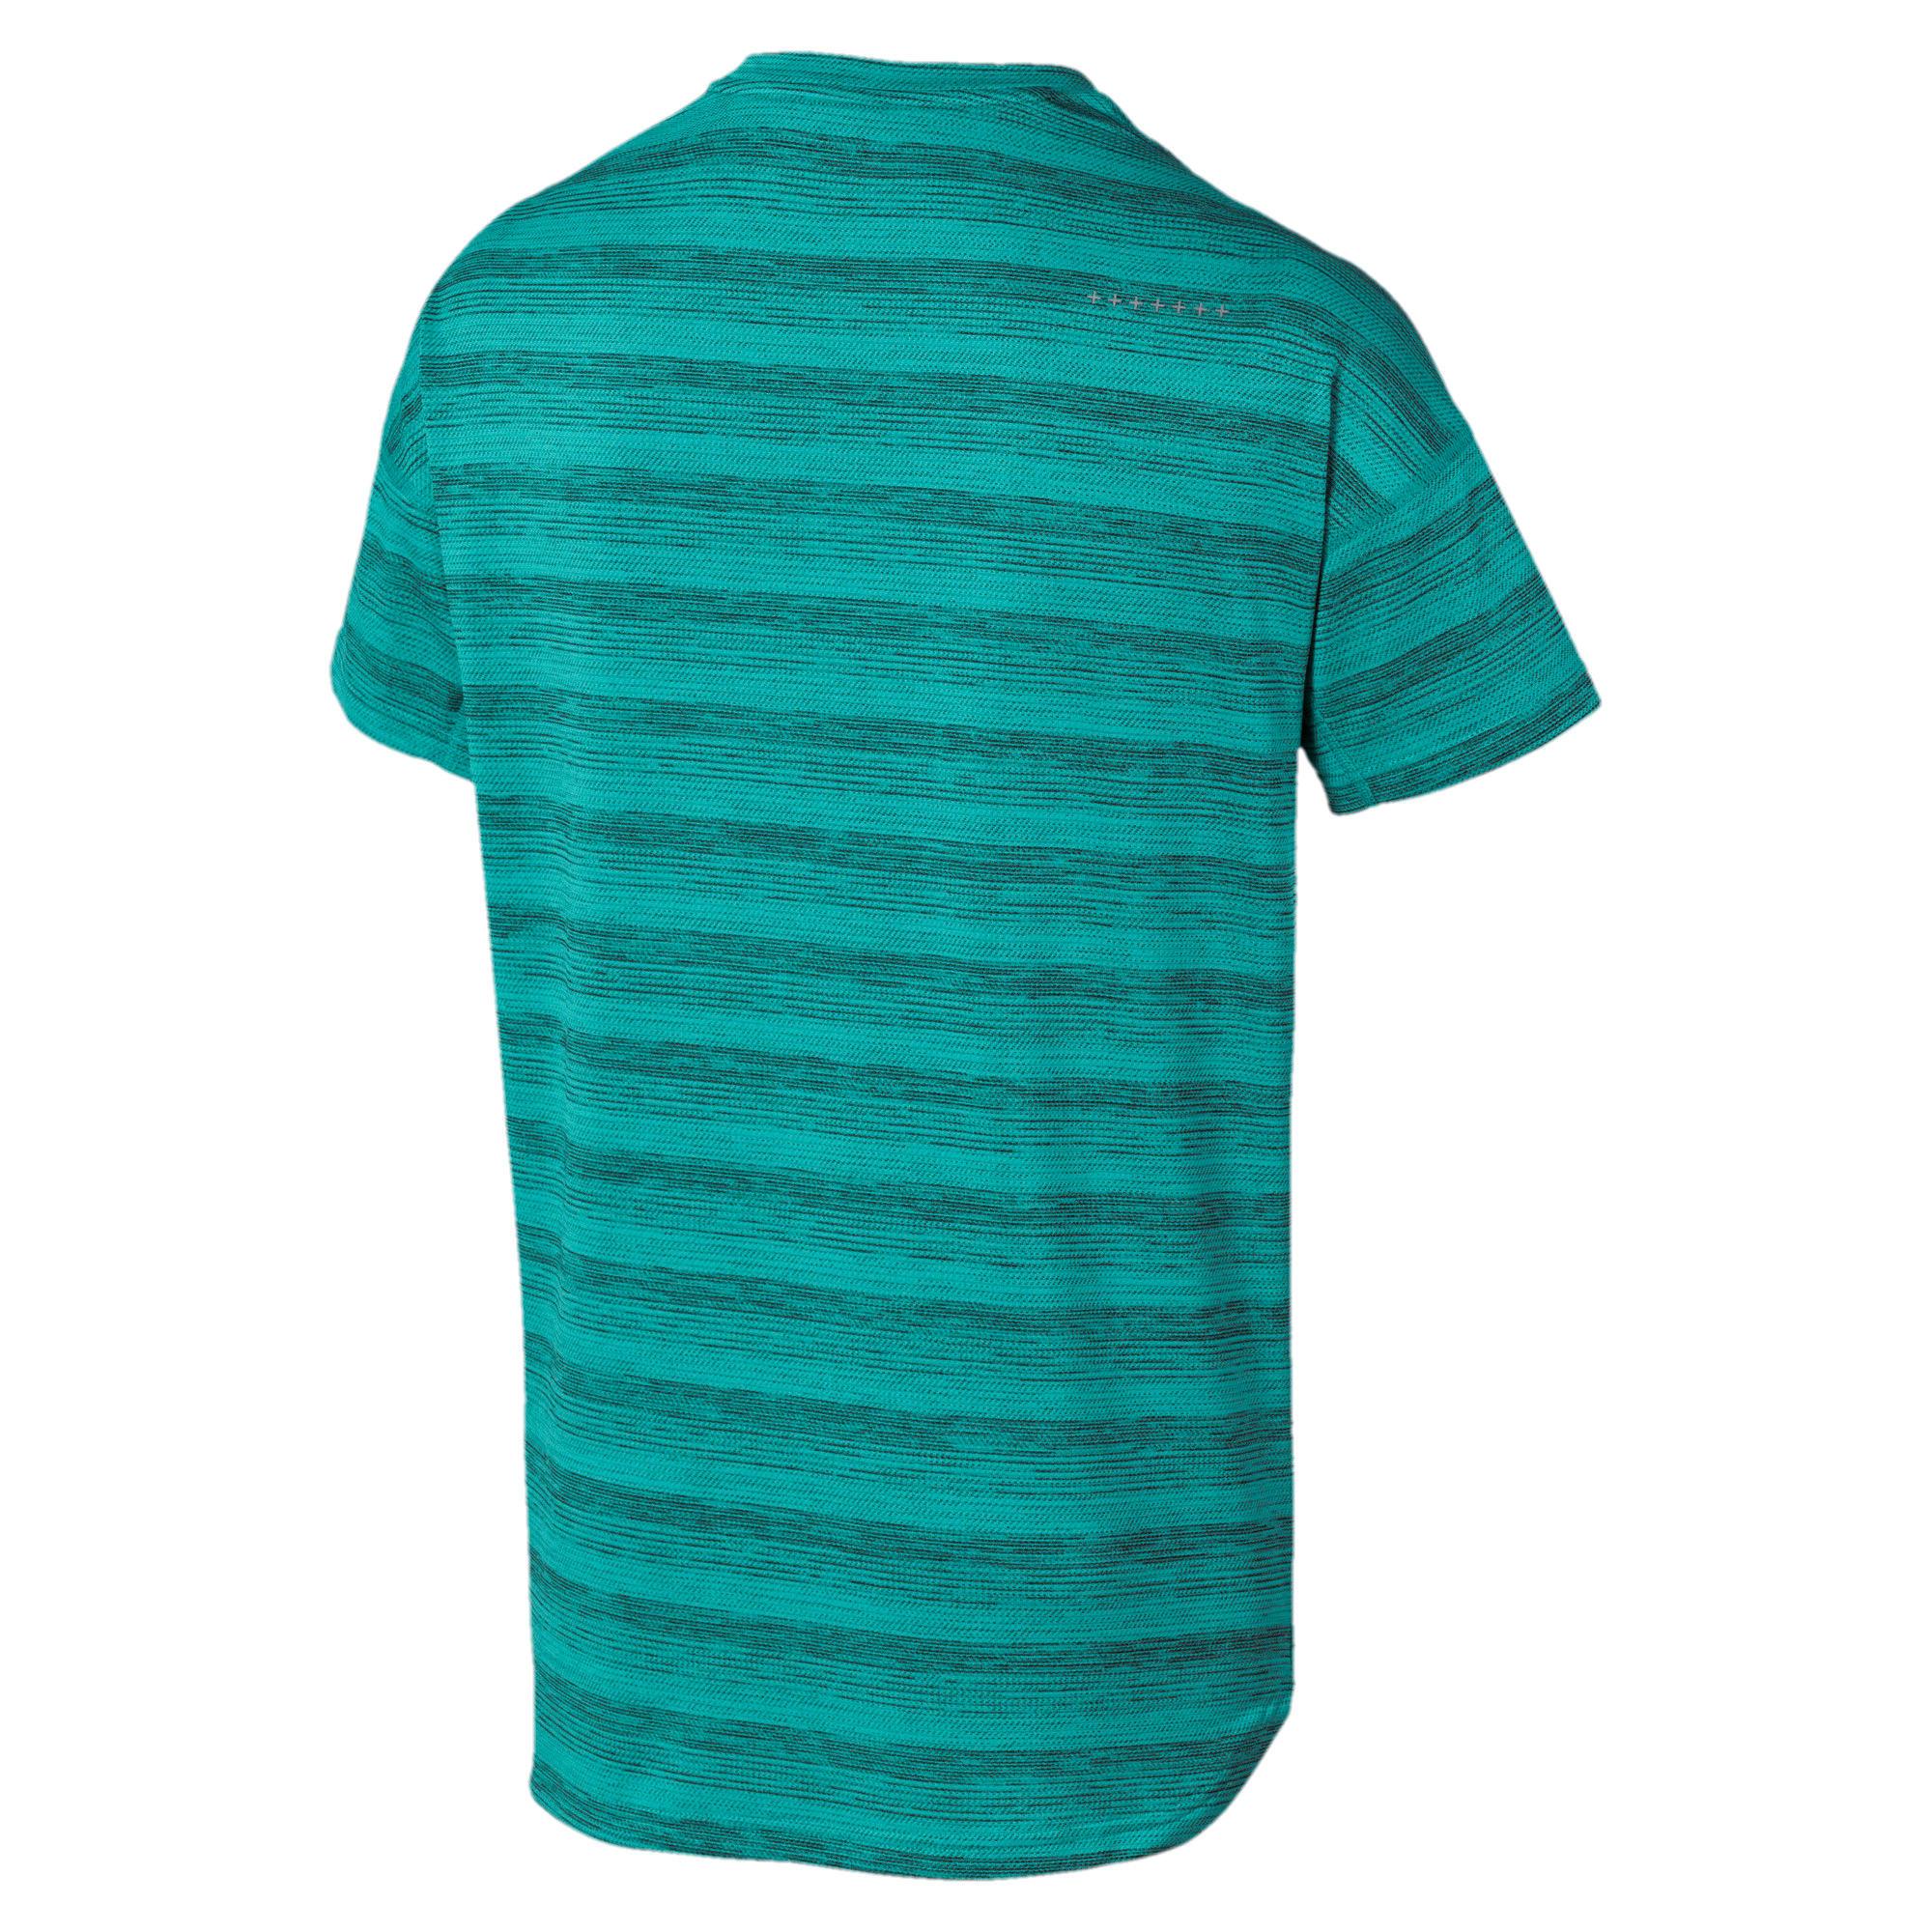 Thumbnail 6 of LAST LAP ヘザー SS ランニング Tシャツ 半袖, Blue Turquoise Heather, medium-JPN